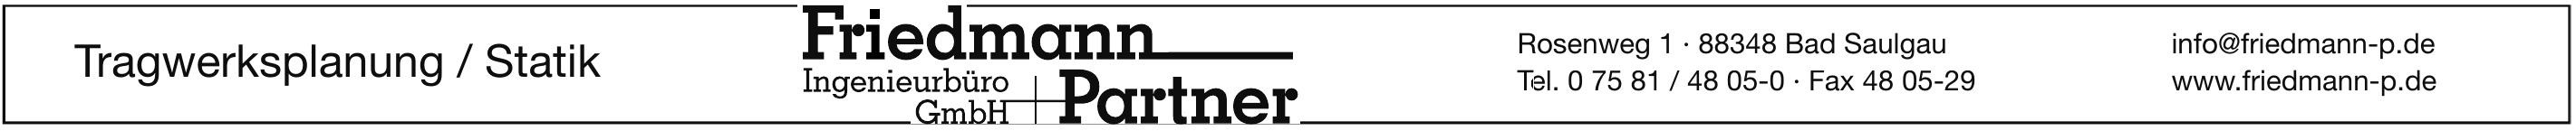 Friedmann & Partner / Ingenieurbüro GmbH